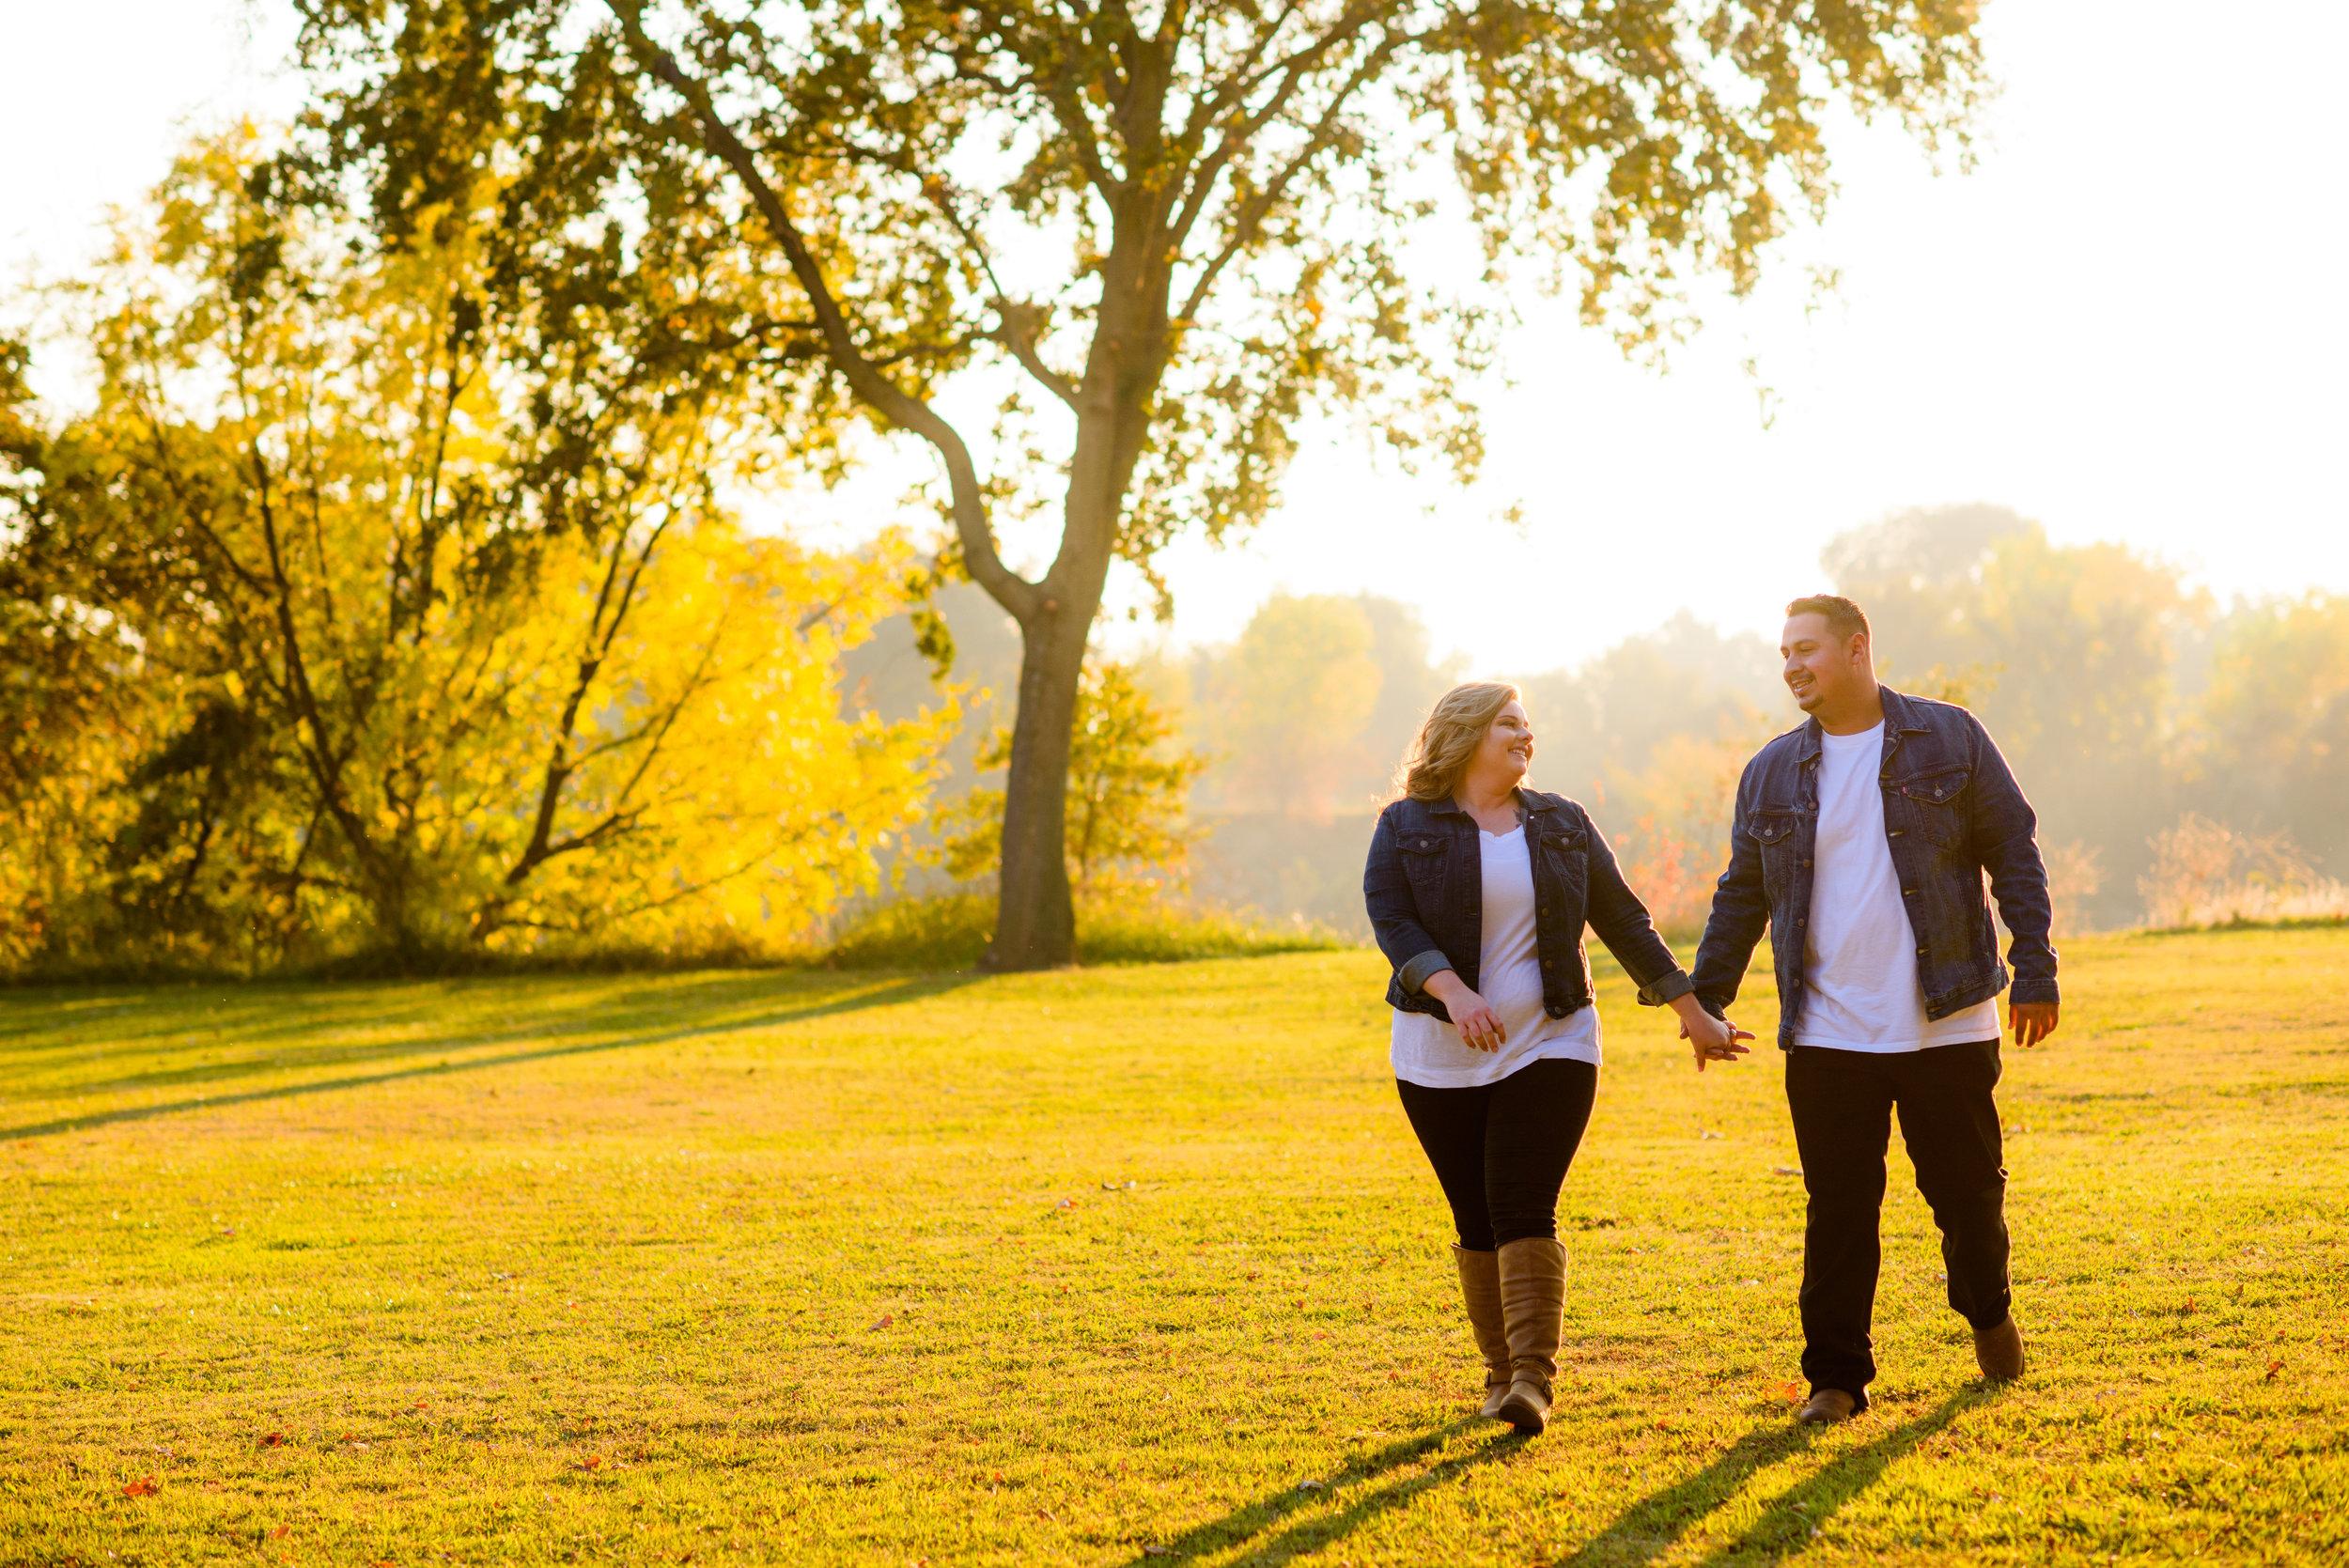 lynzie-javier-007-sacramento-california-engagement-wedding-photographer-katherine-nicole-photography.JPG